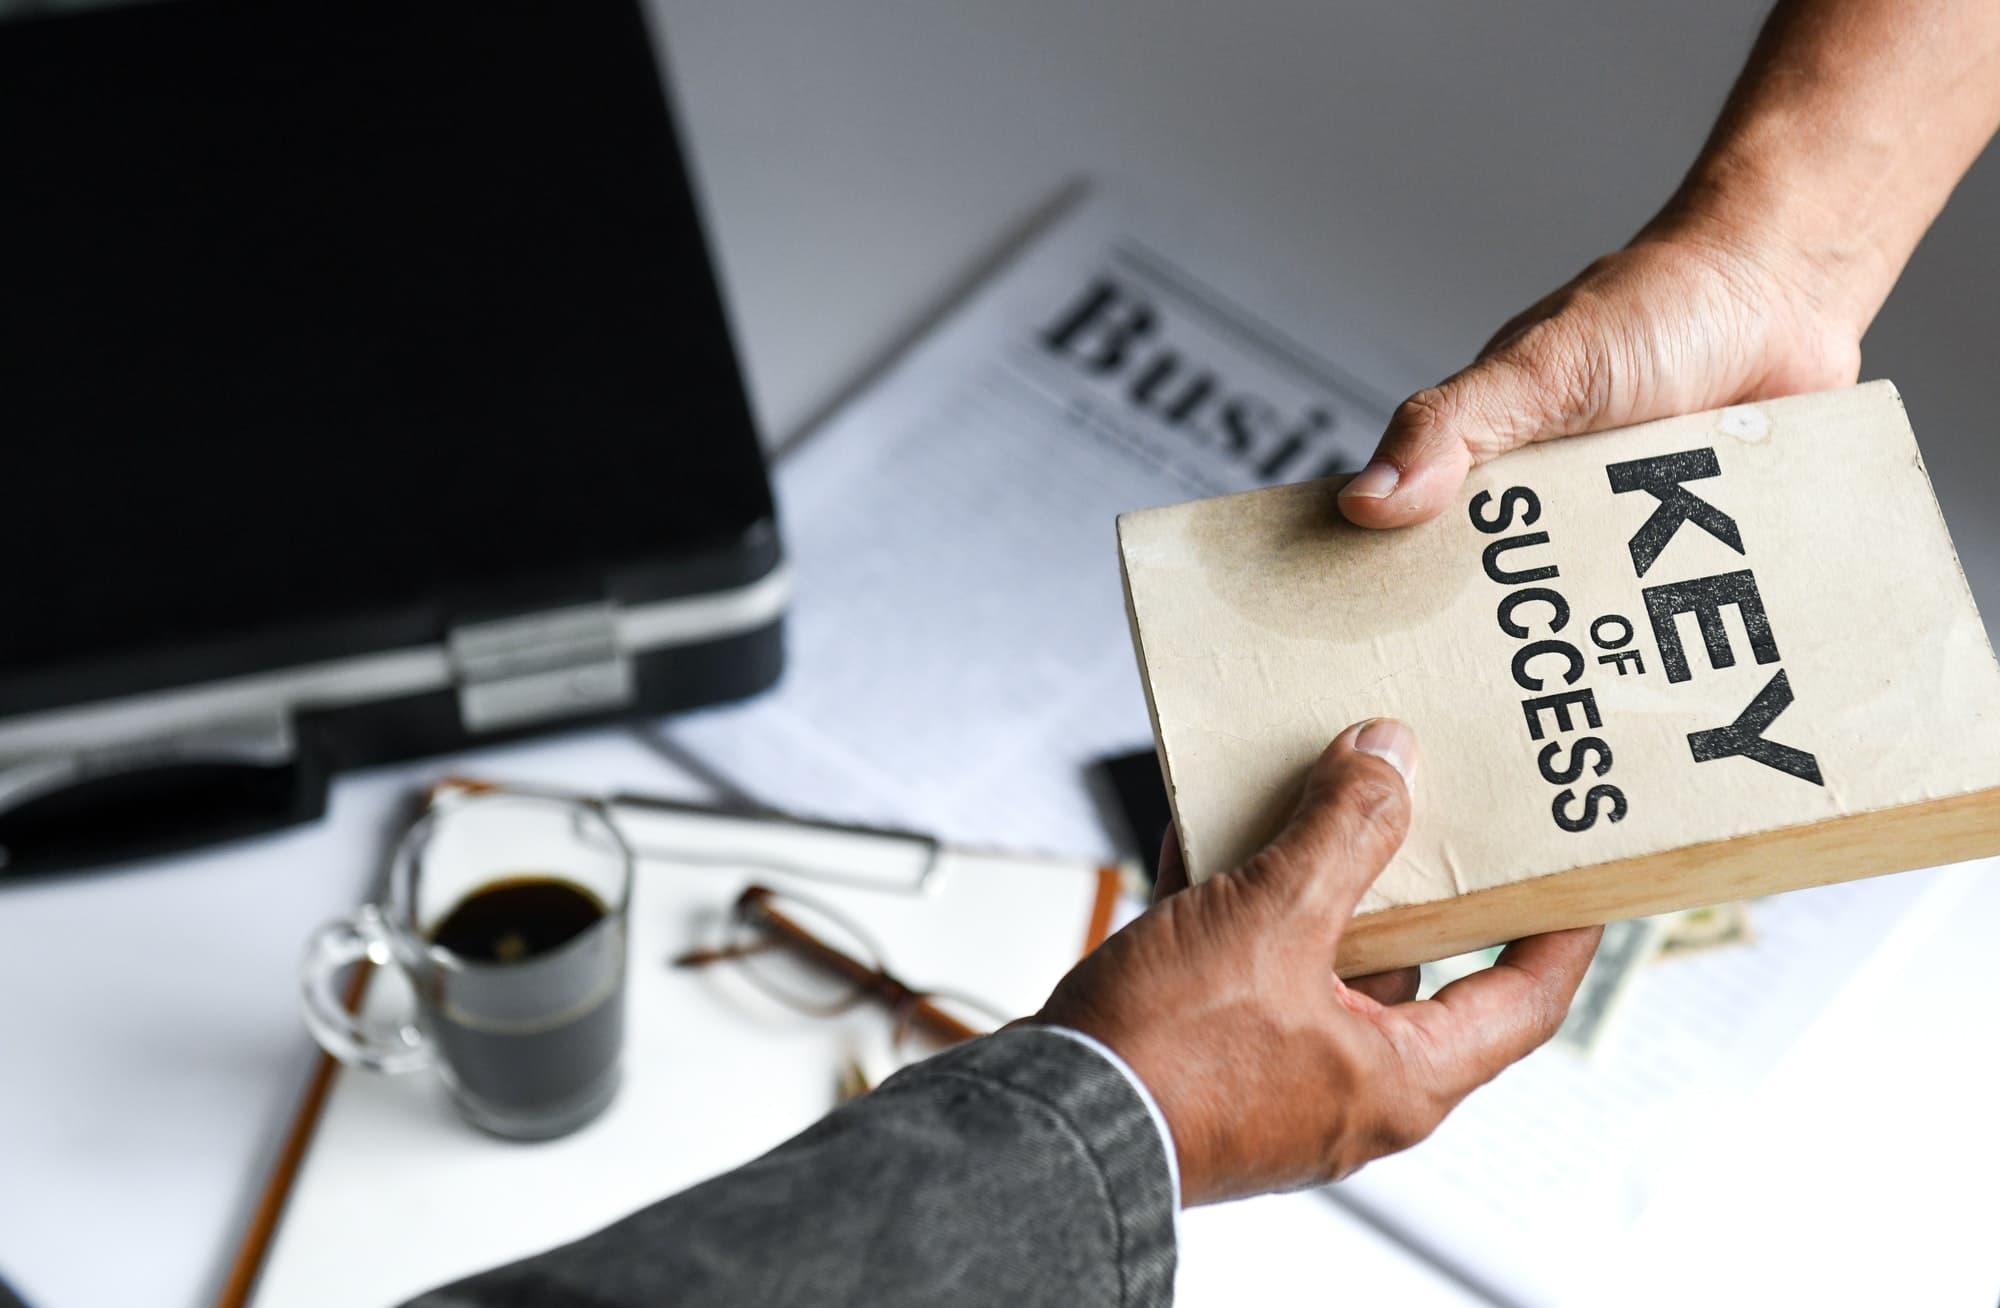 Businessmen deliver key of success book,Business concepts.